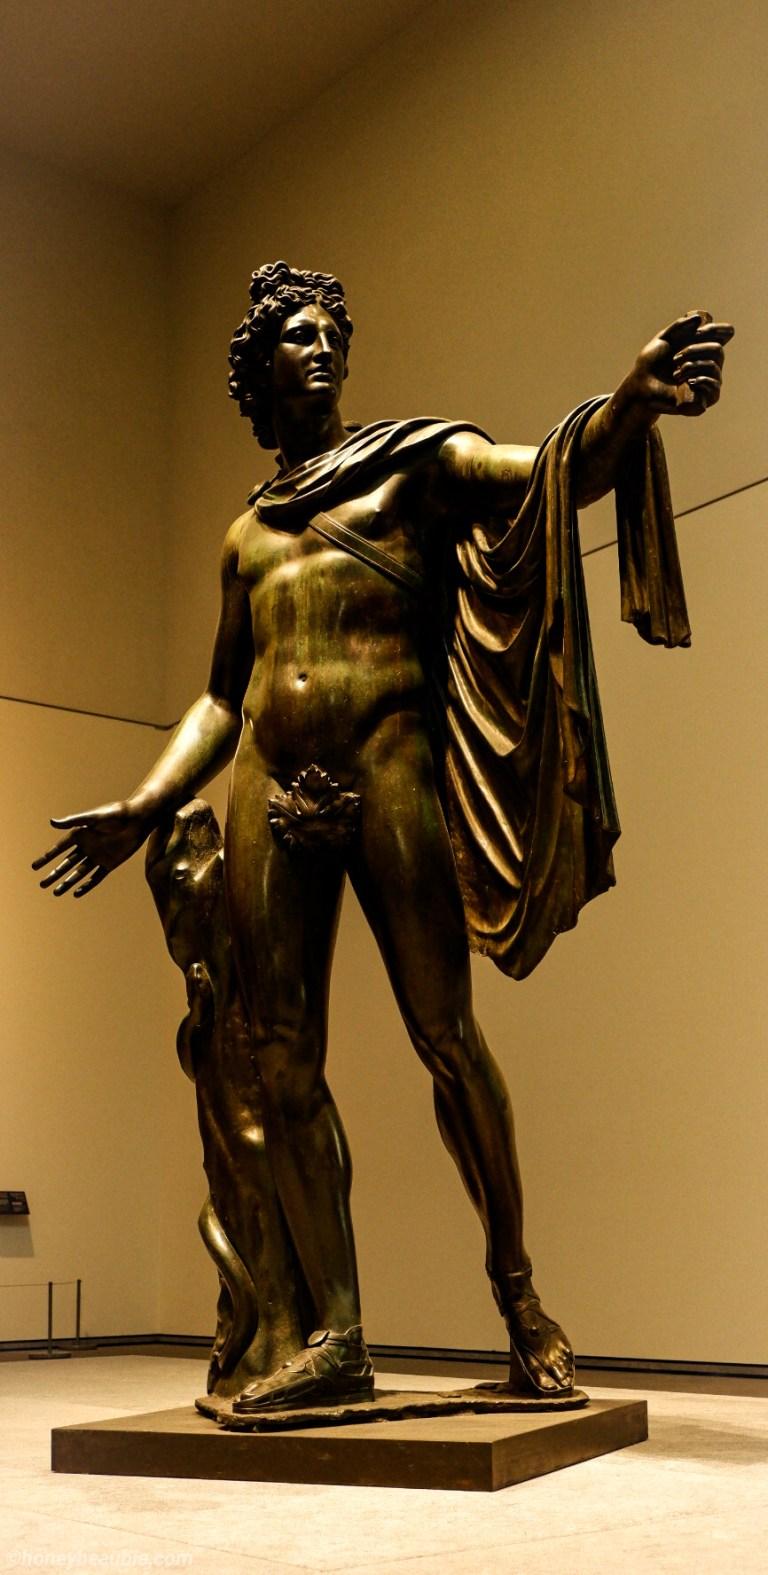 apollo-bronze-statue-classic-art-louvre-abu-dhabi